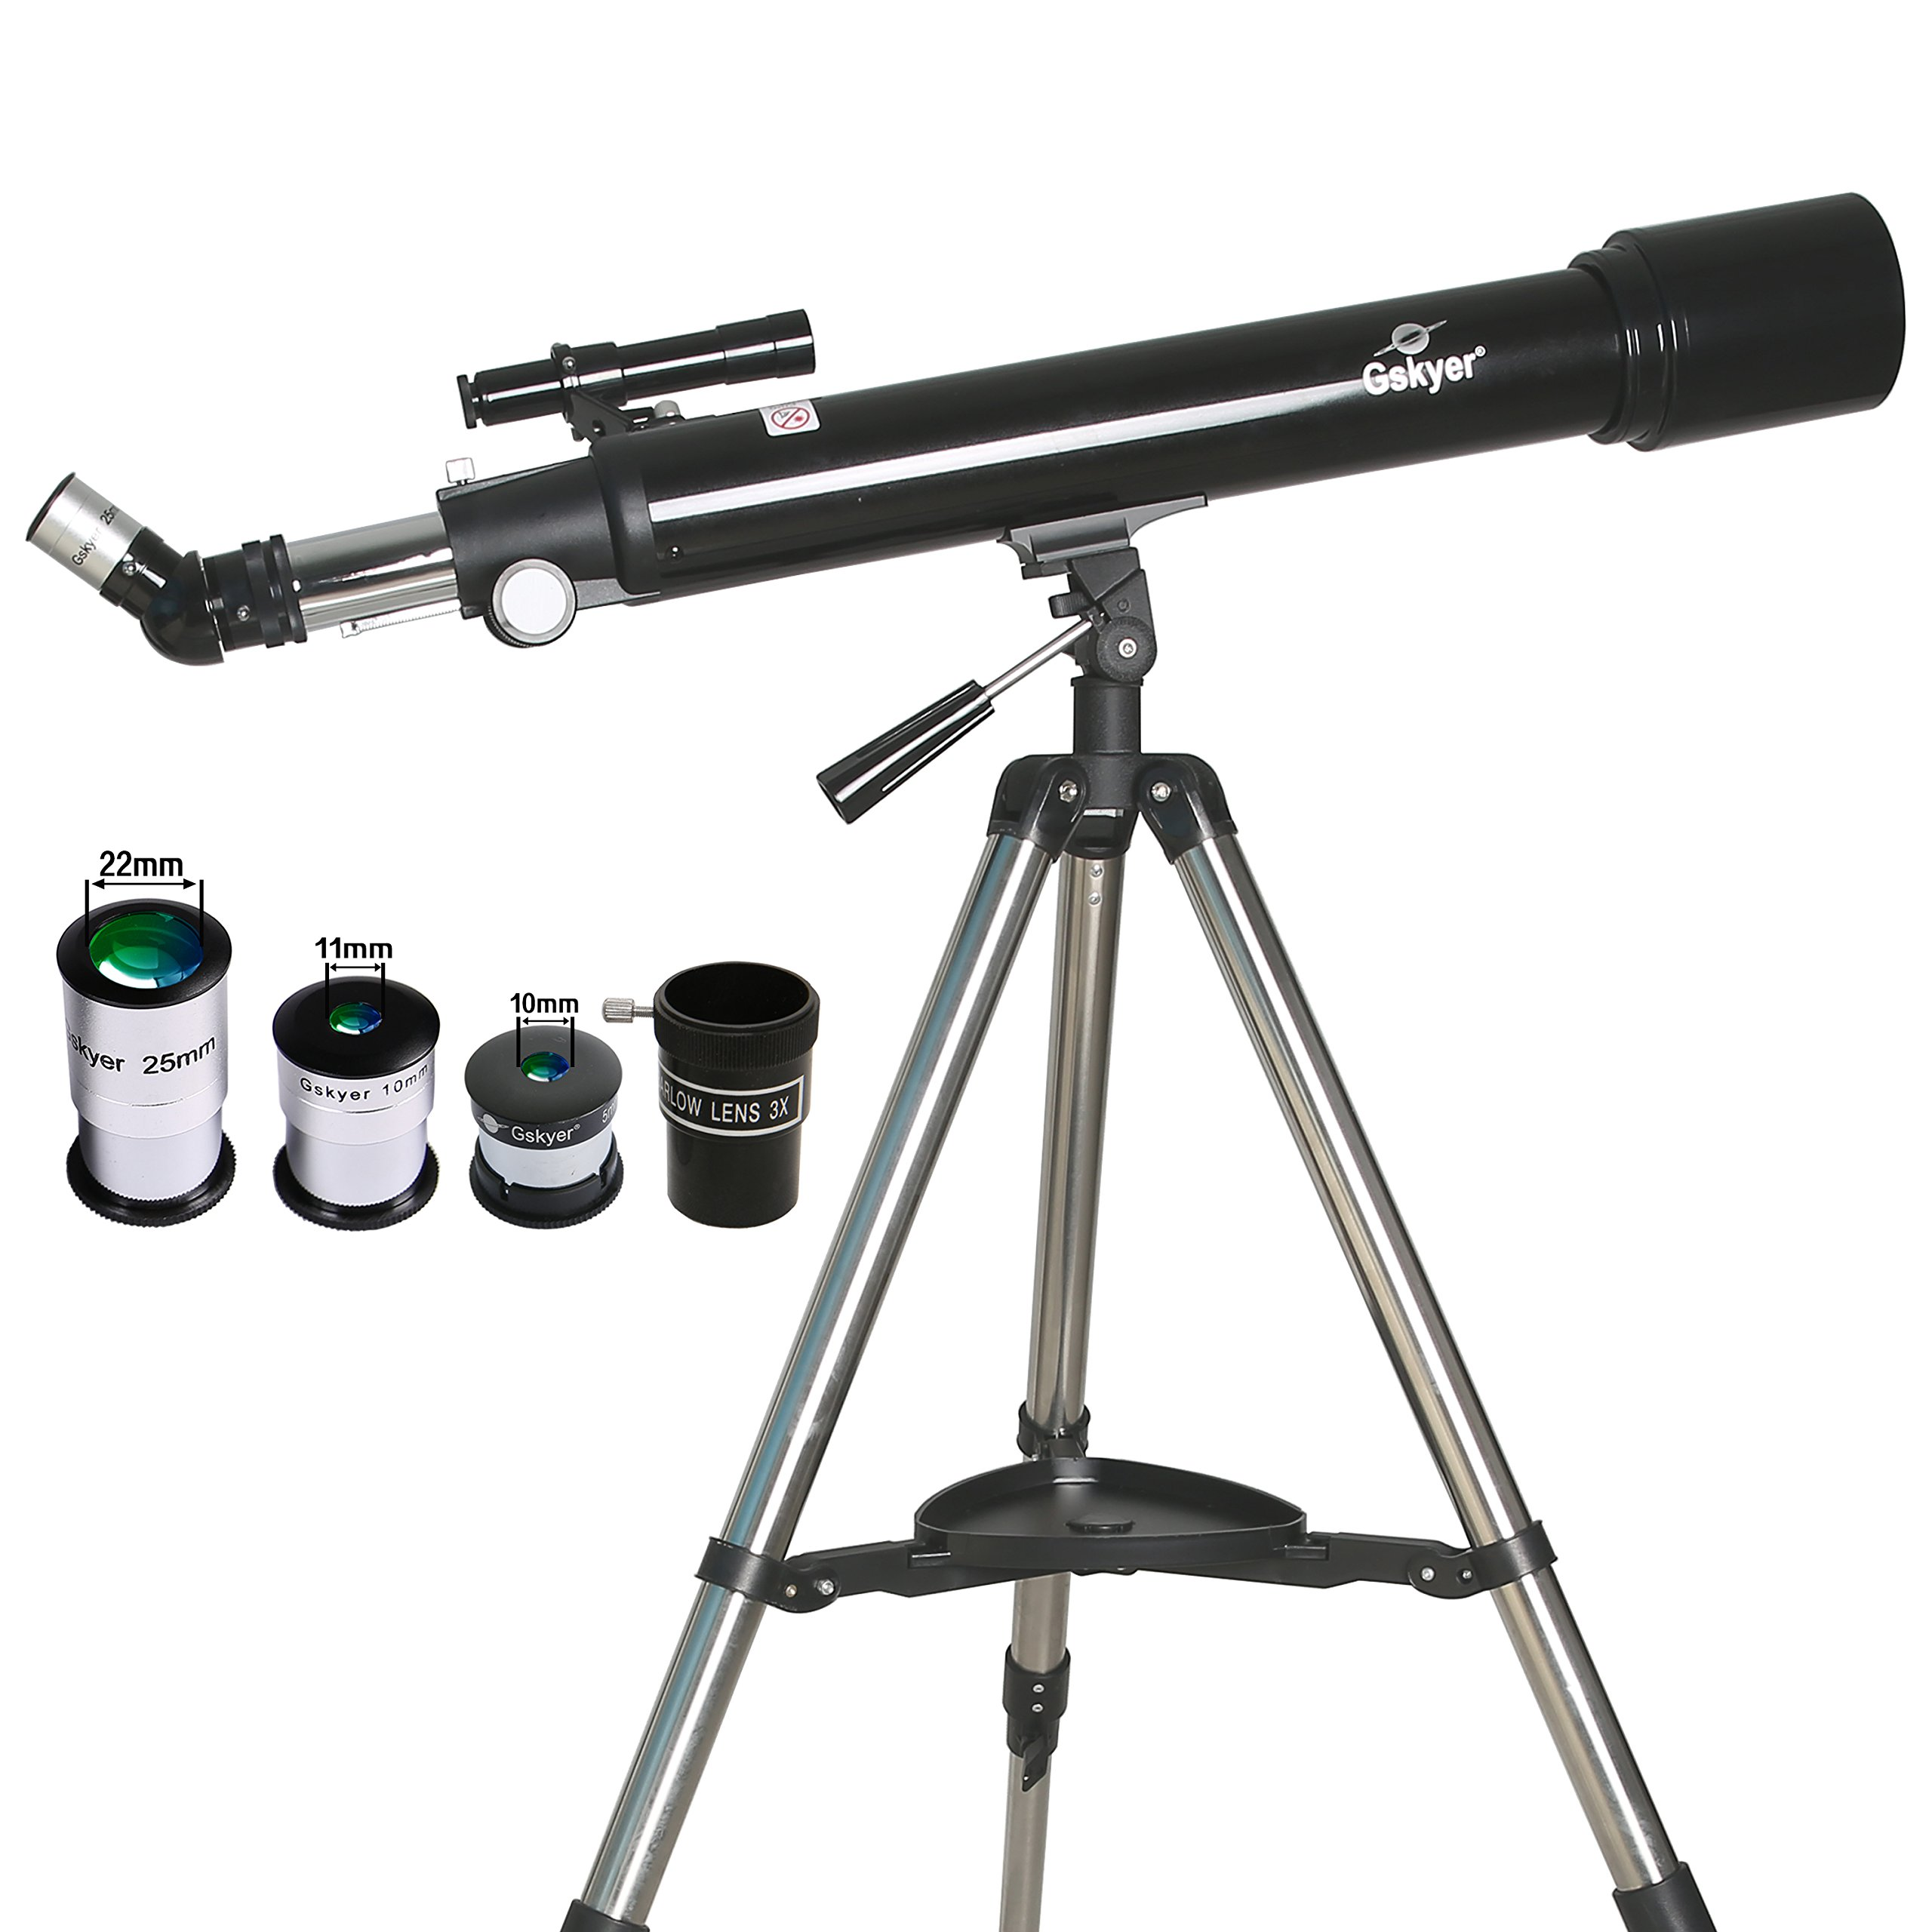 Gskyer Telescope,AZ70700 German Technology Telescope,Instruments Infinity Refractor by Gskyer